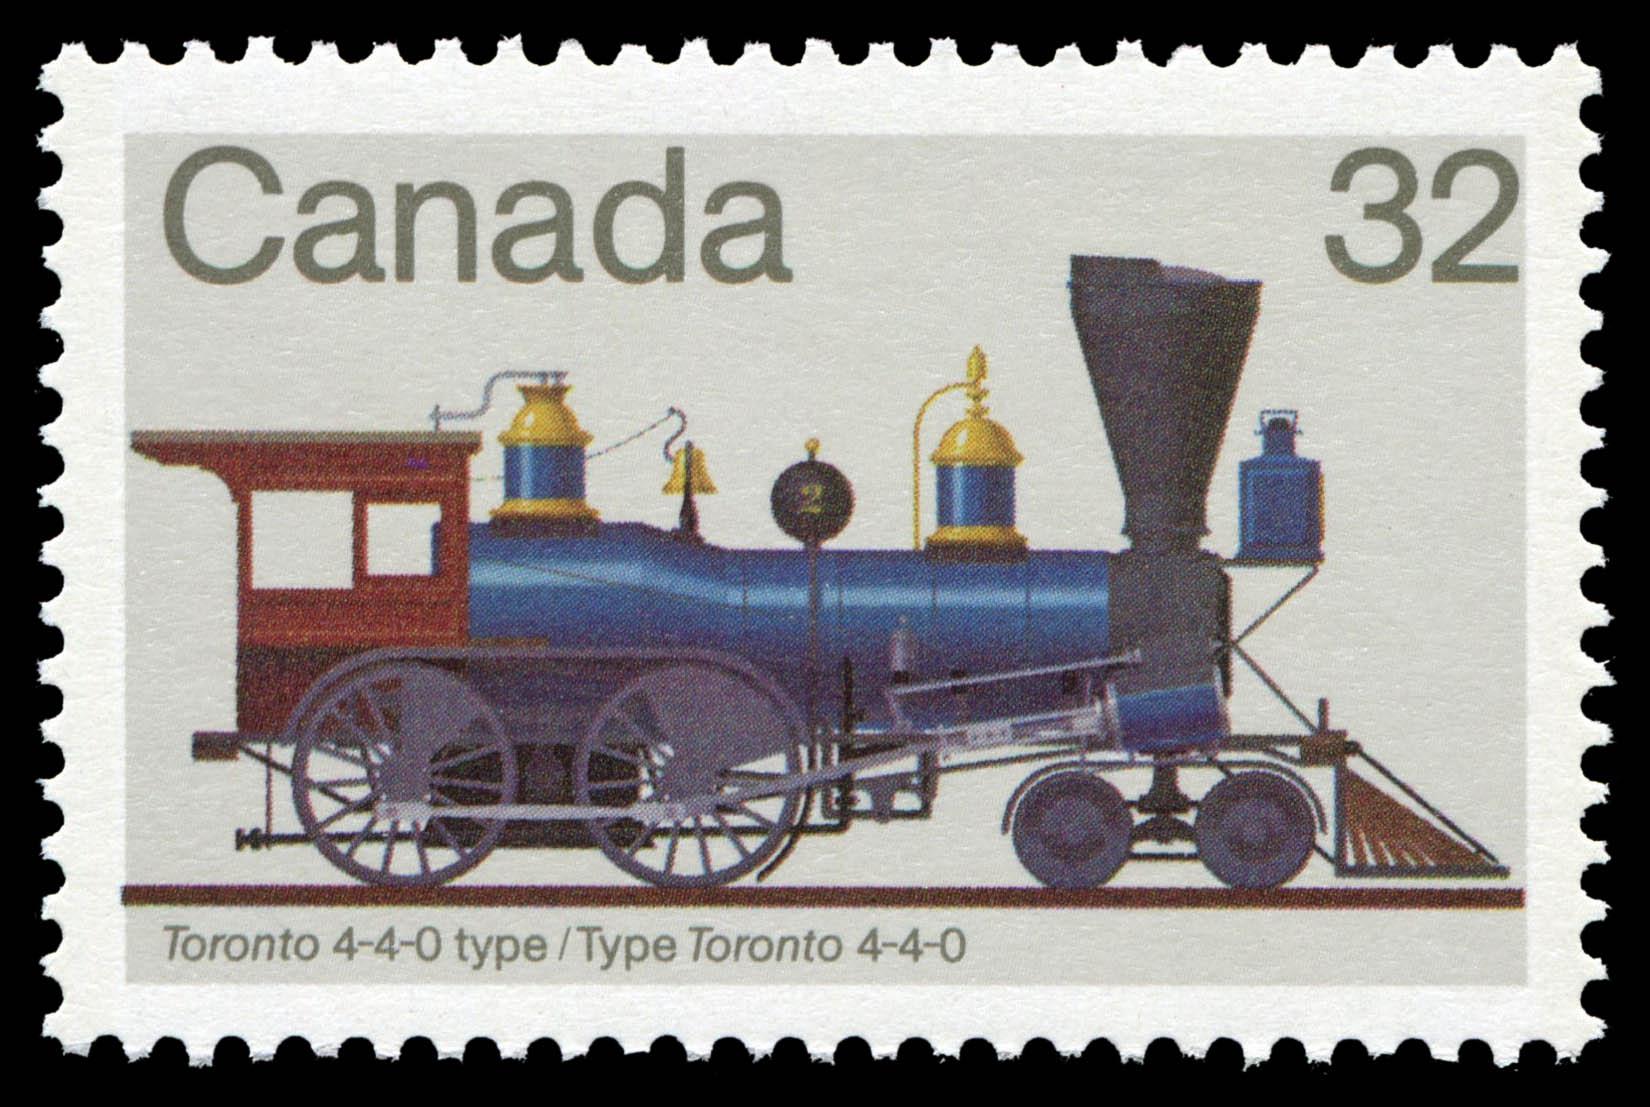 Toronto 4-4-0 Type Canada Postage Stamp | Canadian Locomotives, 1836-1860